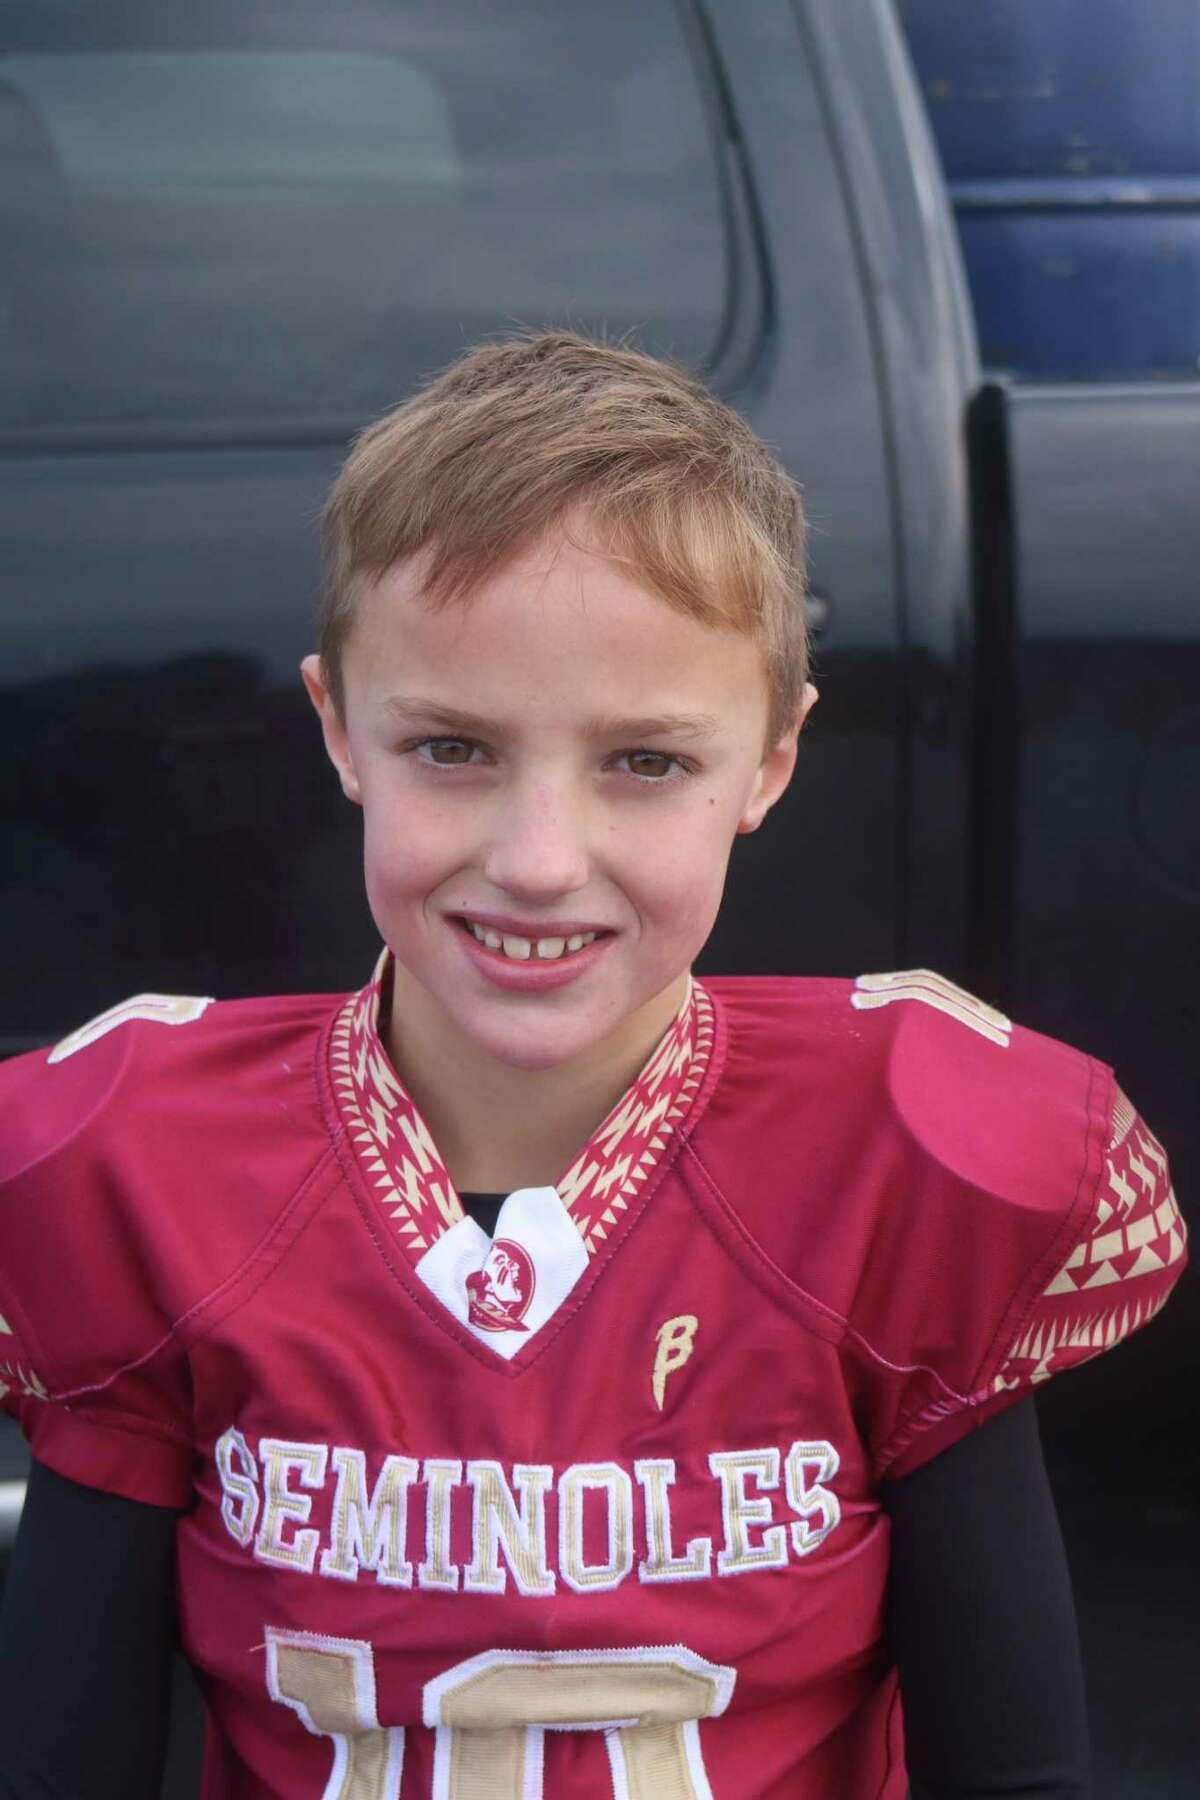 Deer Park Pee Wee Seminoles quarterback Luke Nunn